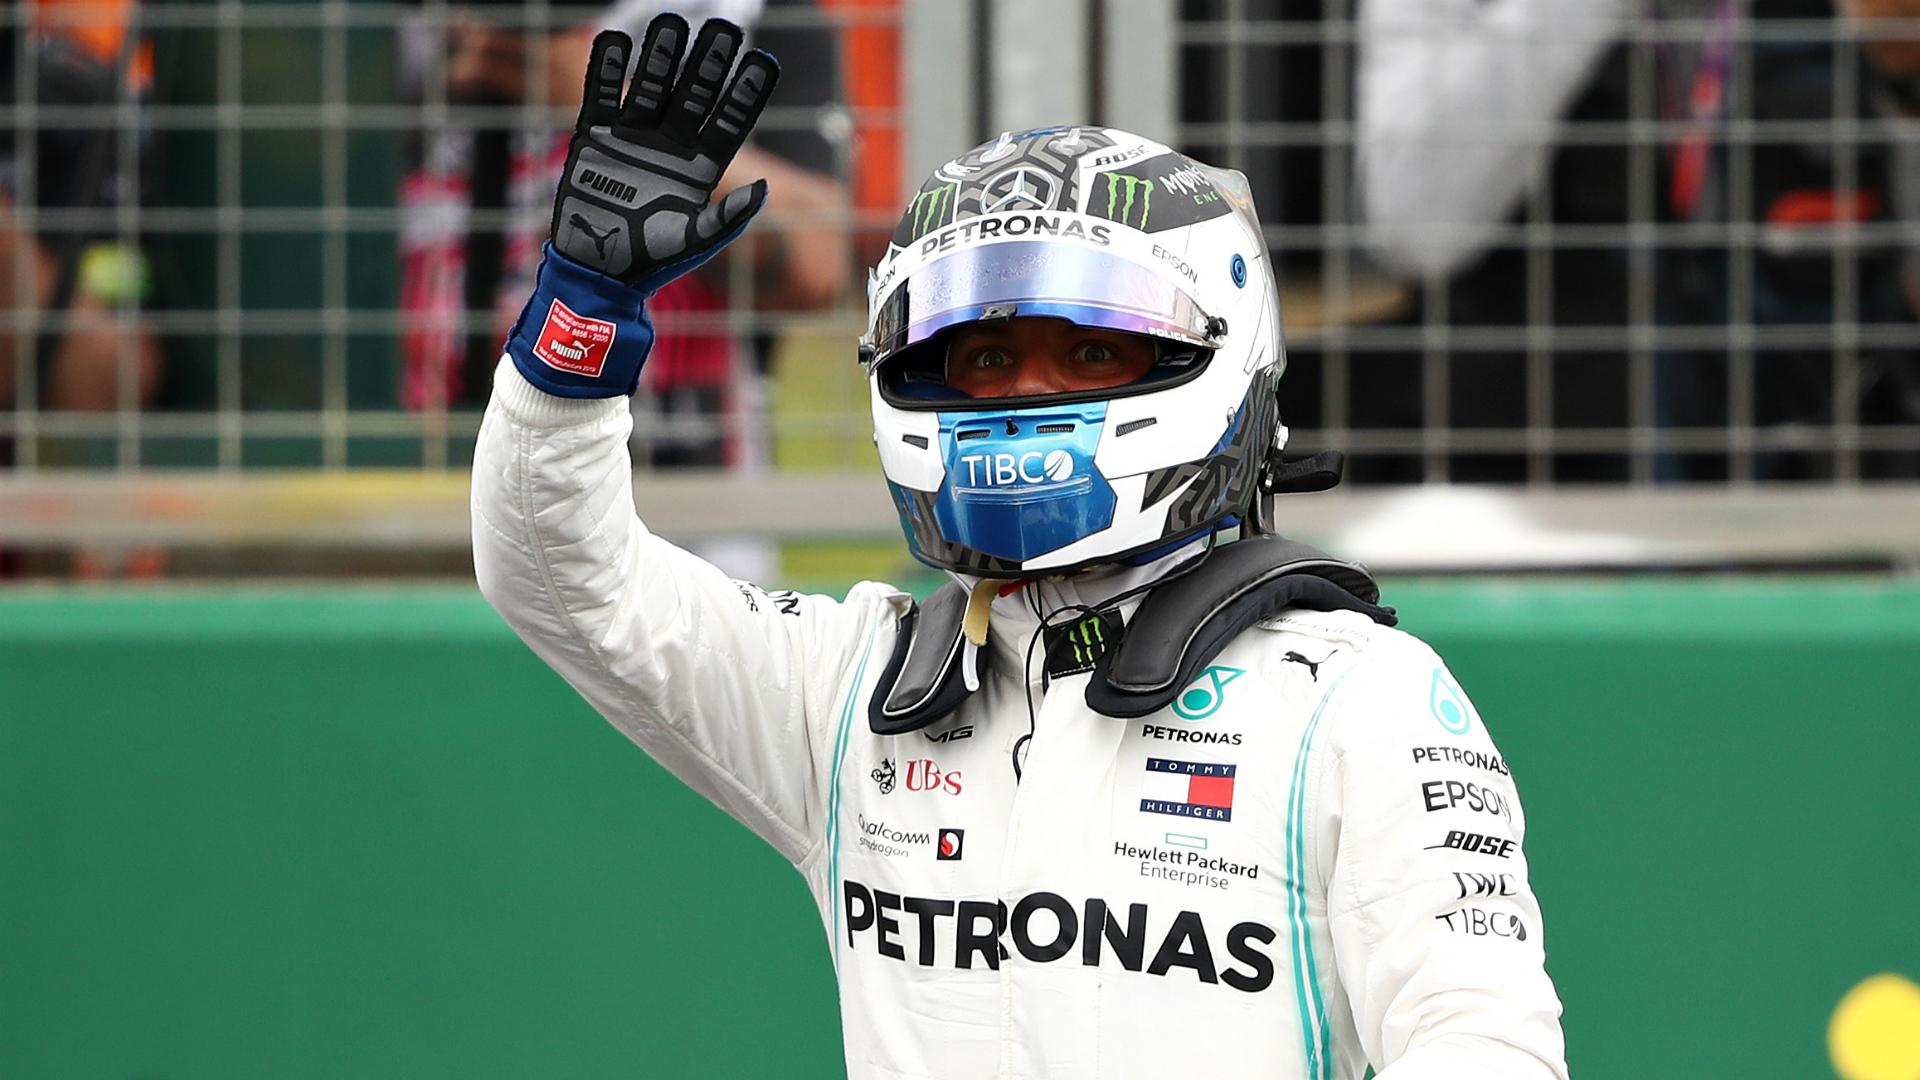 F1 Raceweek: Bottas will take title fight to Hamilton at British Grand Prix